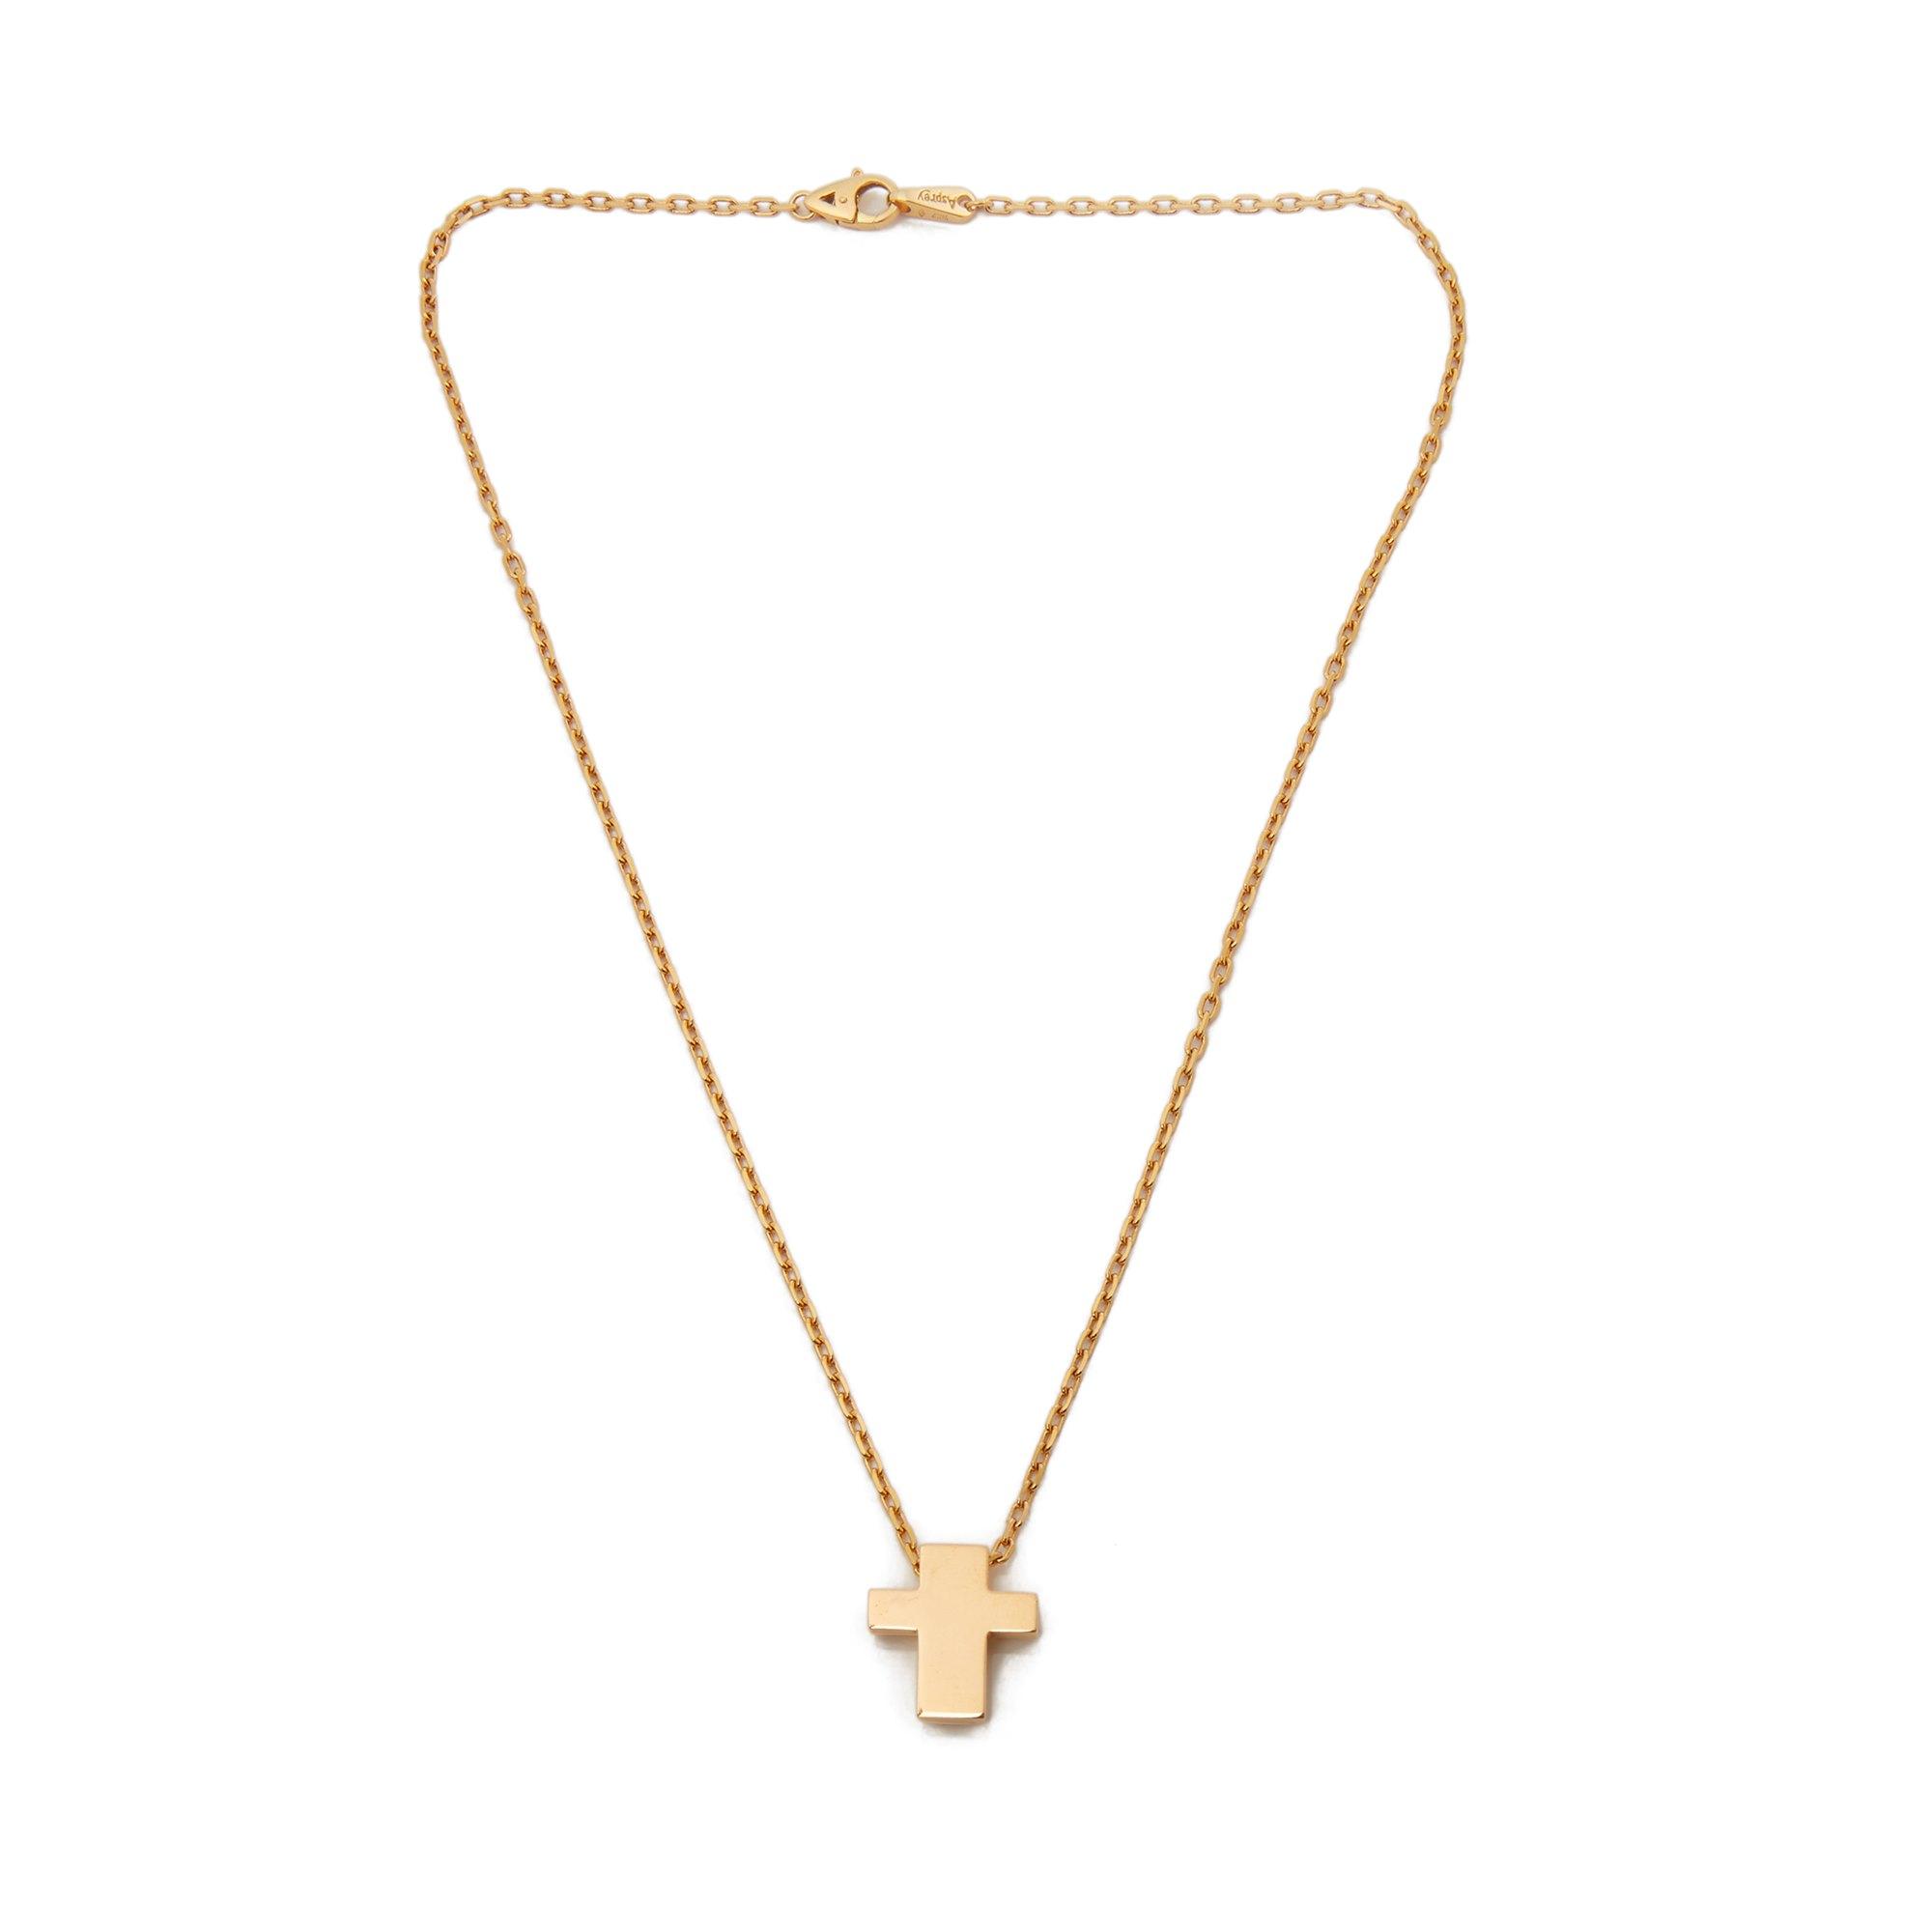 Asprey 18k Yellow Gold Cross Pendant Necklace - Image 4 of 8